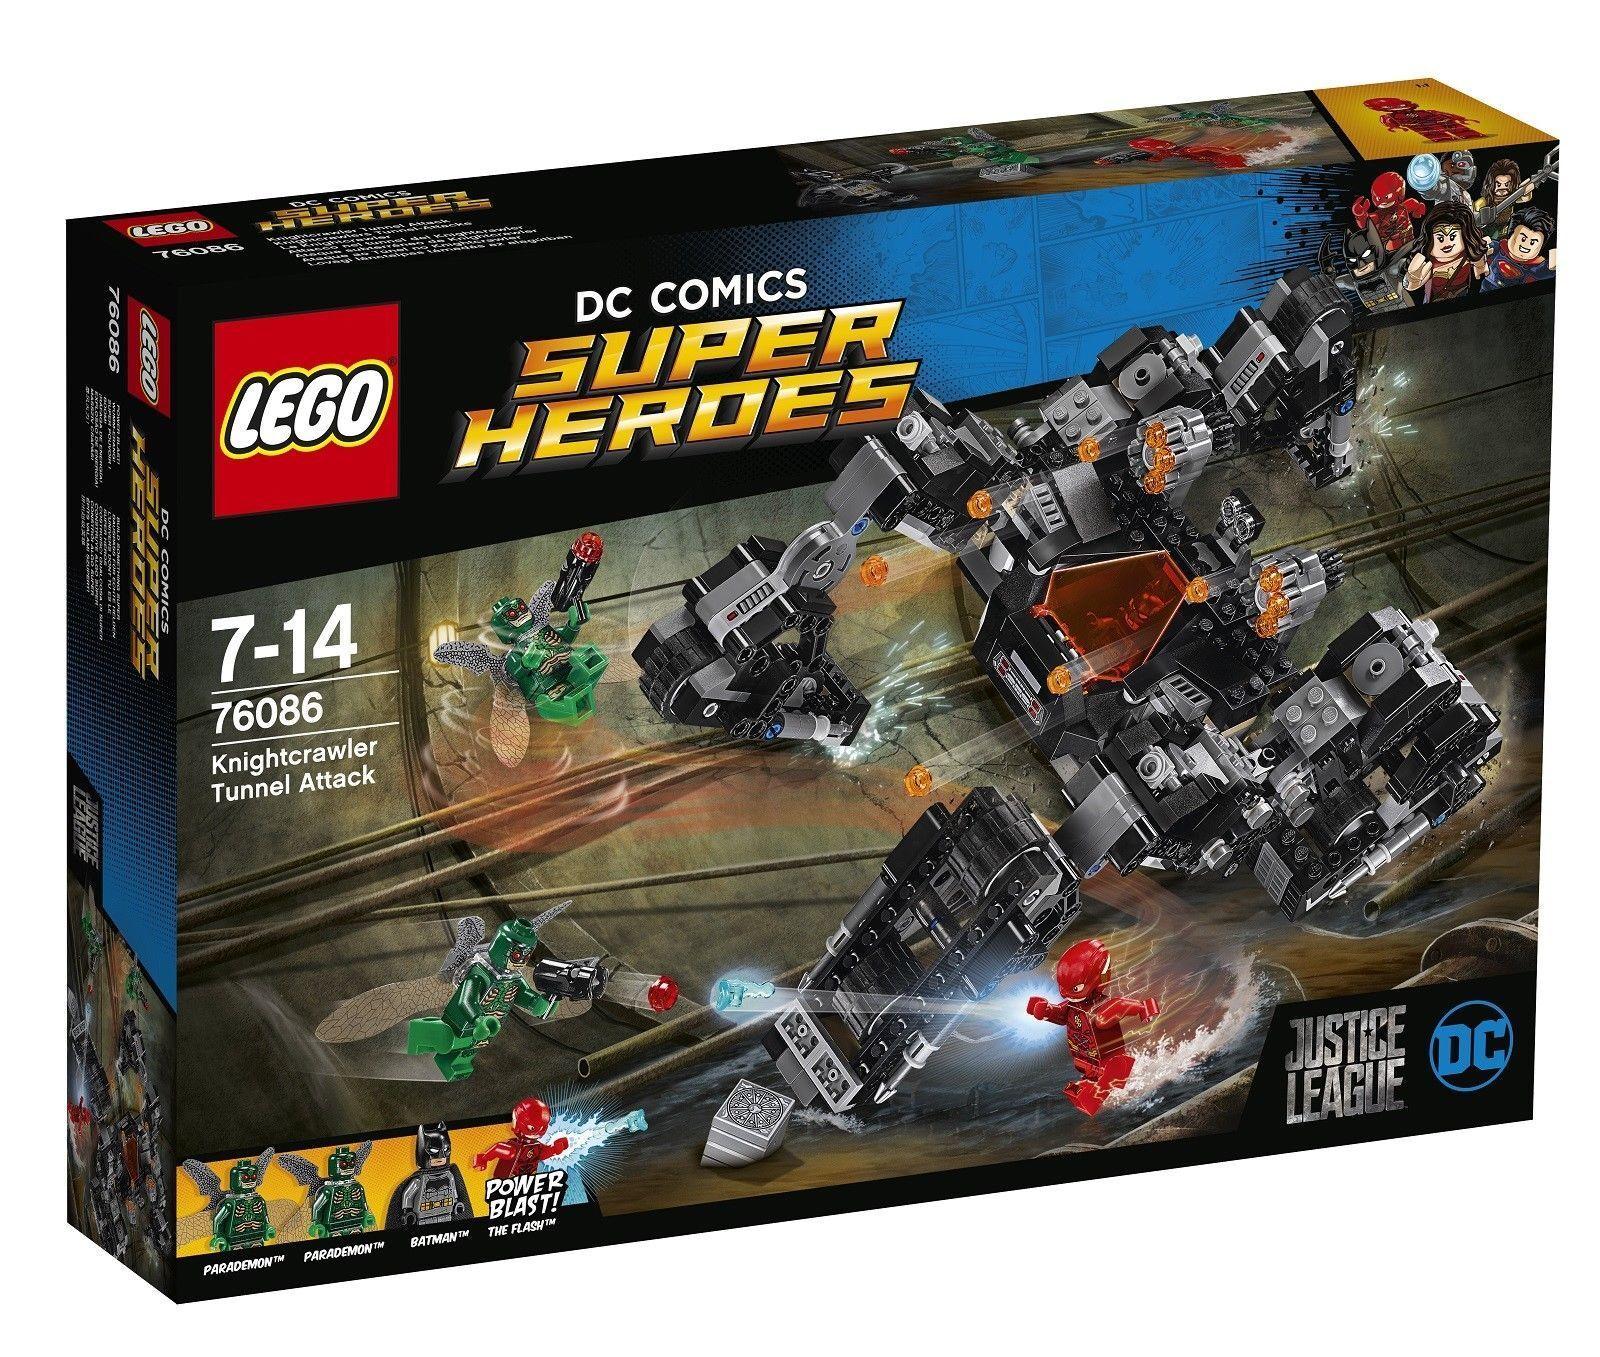 La paix est une bénédiction de fruit Lego Super Heroes Heroes Heroes 76086: Justice League knightcrawler Tunnel attaque-Neuf c04e4c